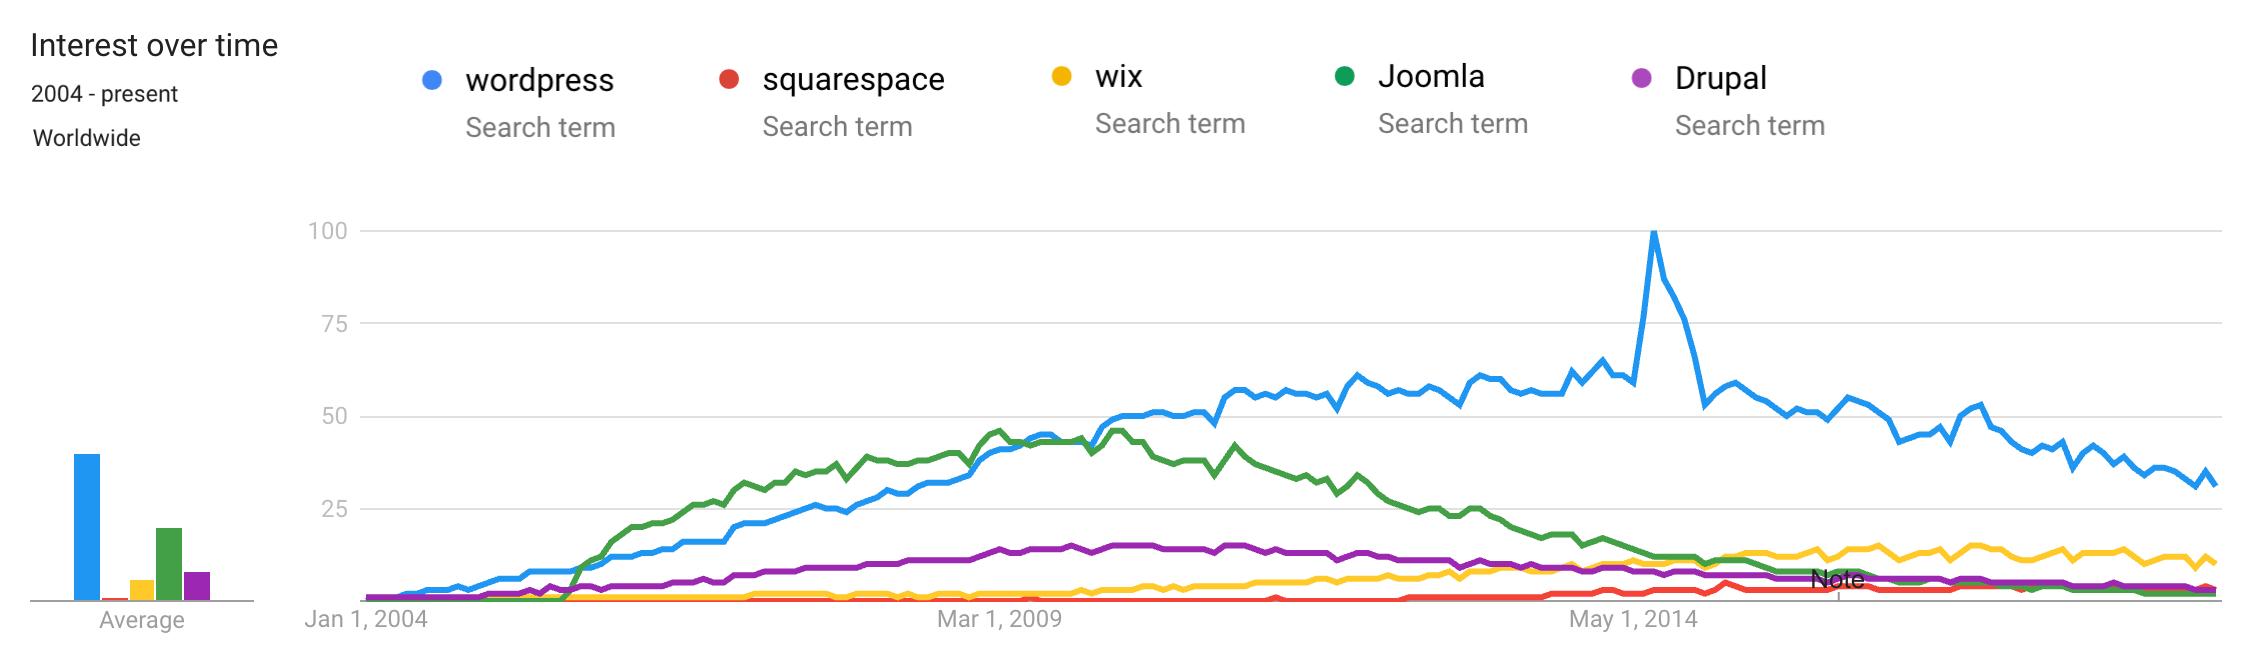 Tendencias de WordPress vs otros CMS